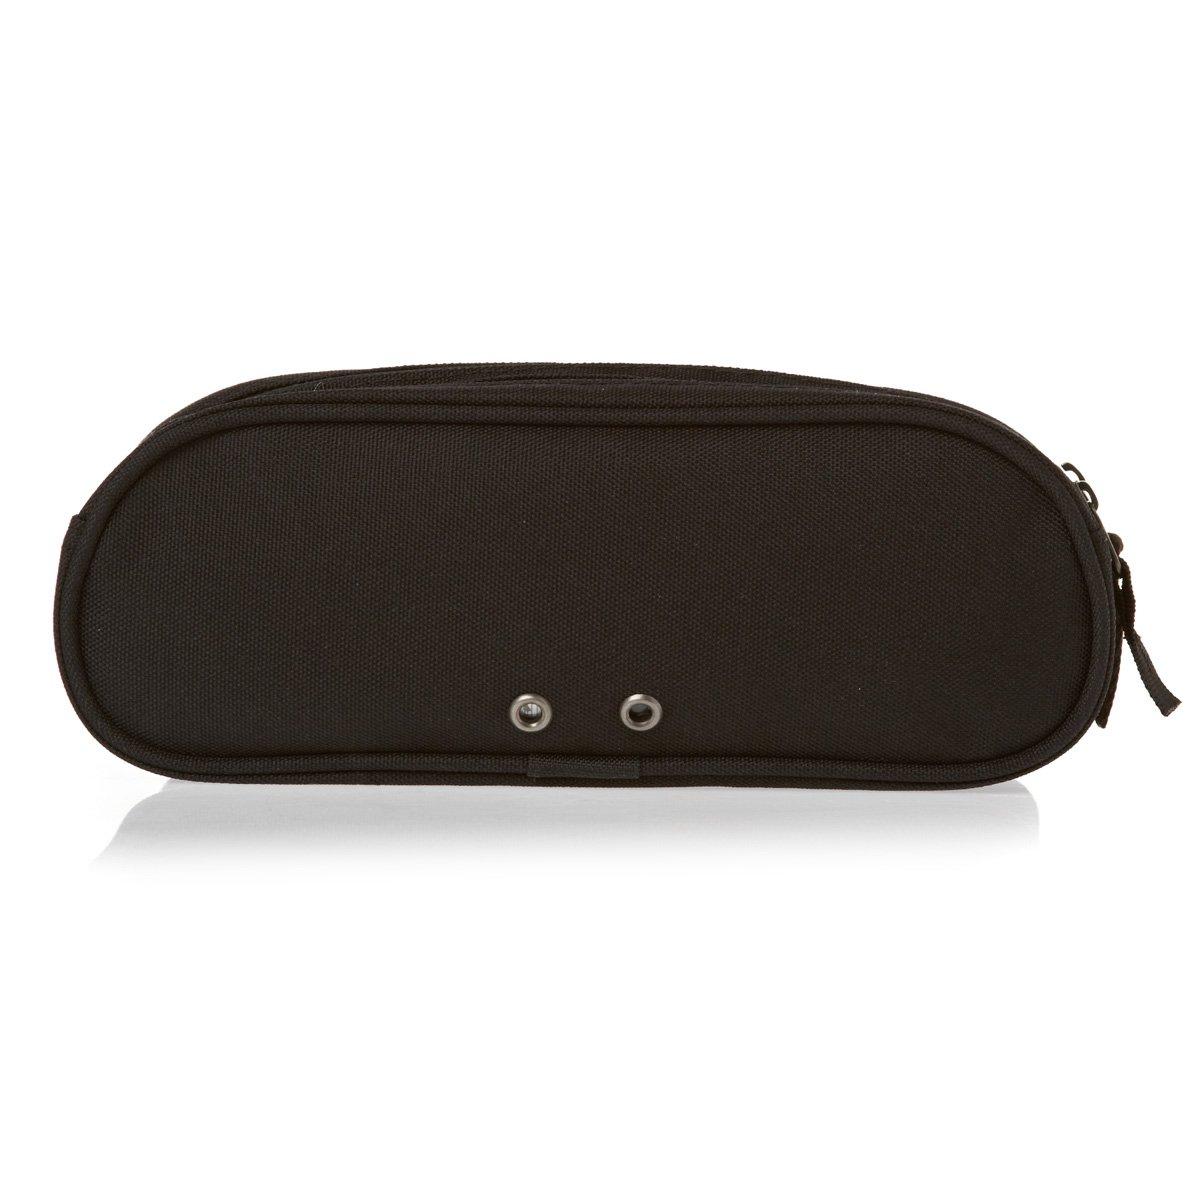 b83431fce9c7ab Converse Double Pencil Case (Jet Black)  Amazon.ca  Luggage   Bags